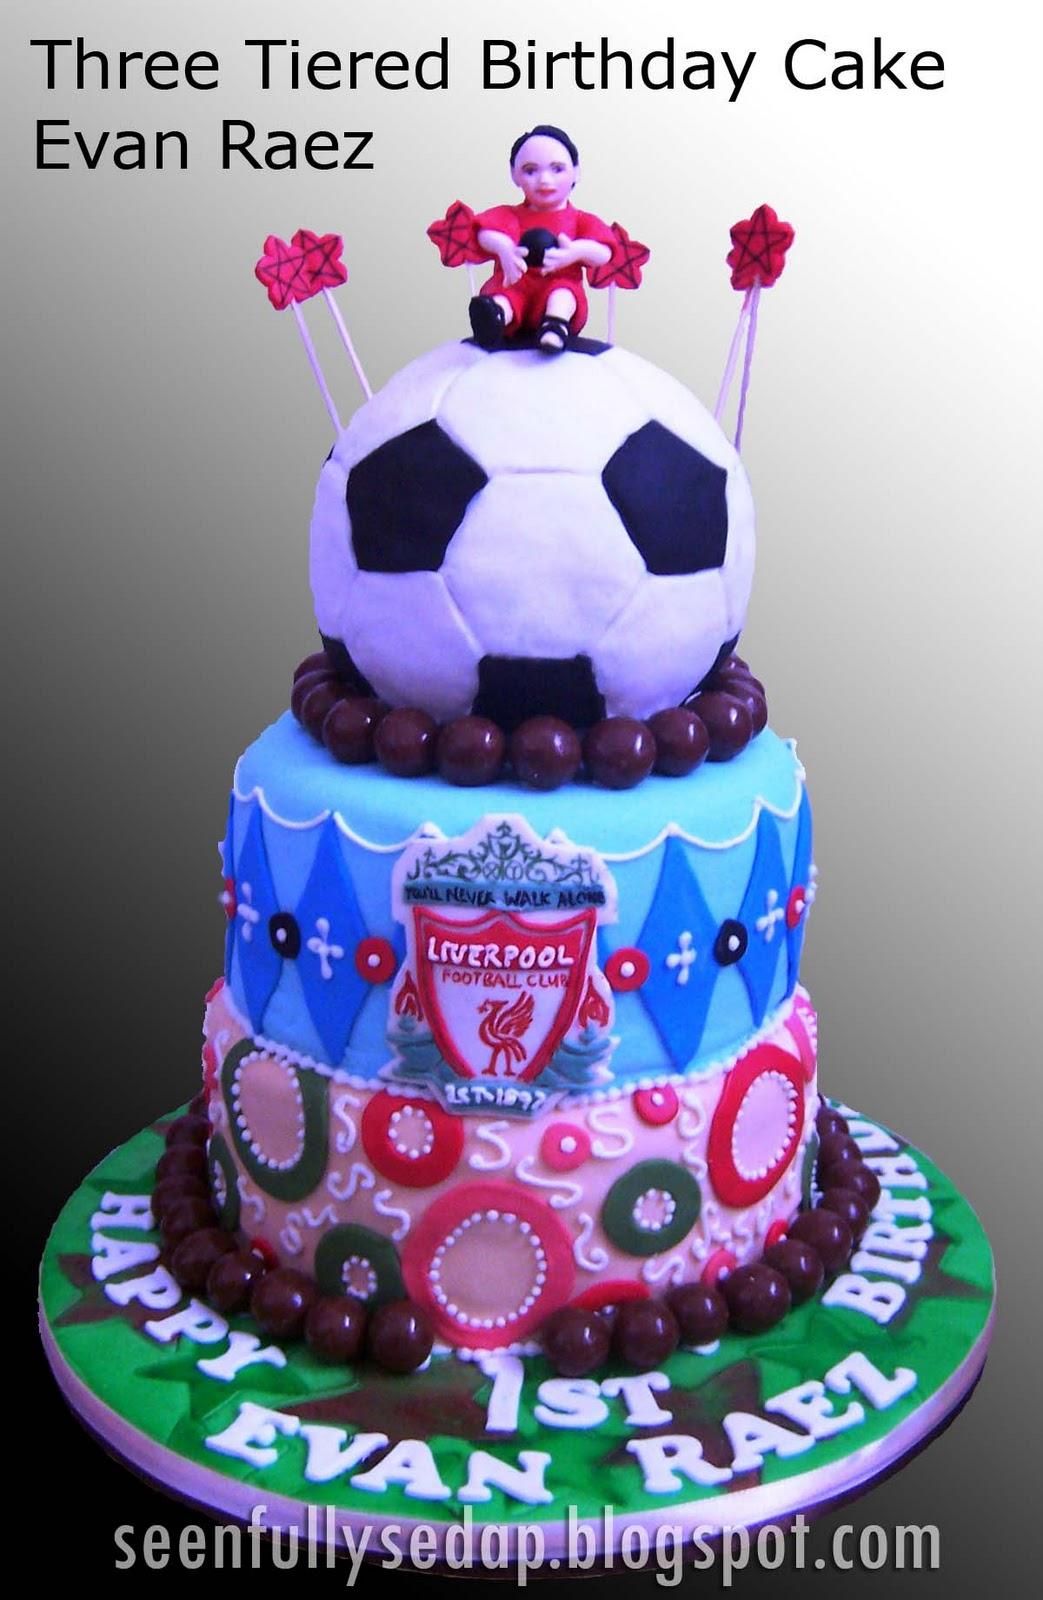 Birthday Cake Evan Raez